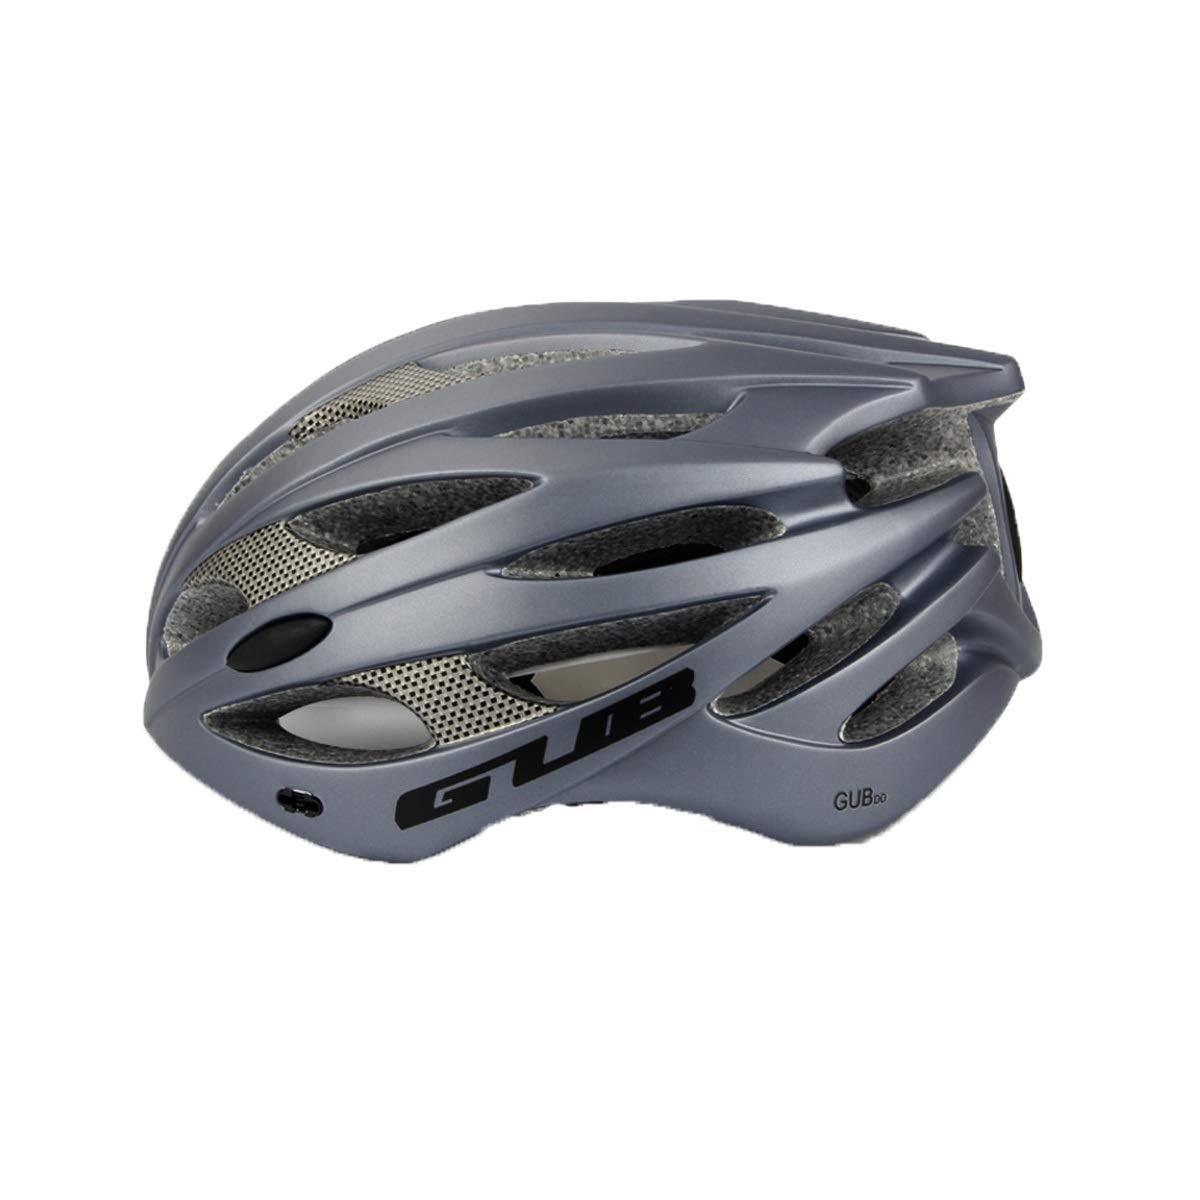 Muziwenju Road Bike Helmet, Traverse H1 2-in-1 Convertible Ski & Snowboard/Bike & Skate Helmet with 28 Vents Latest Style, Practical (Color : Black, Size : XL(58-65 cm))